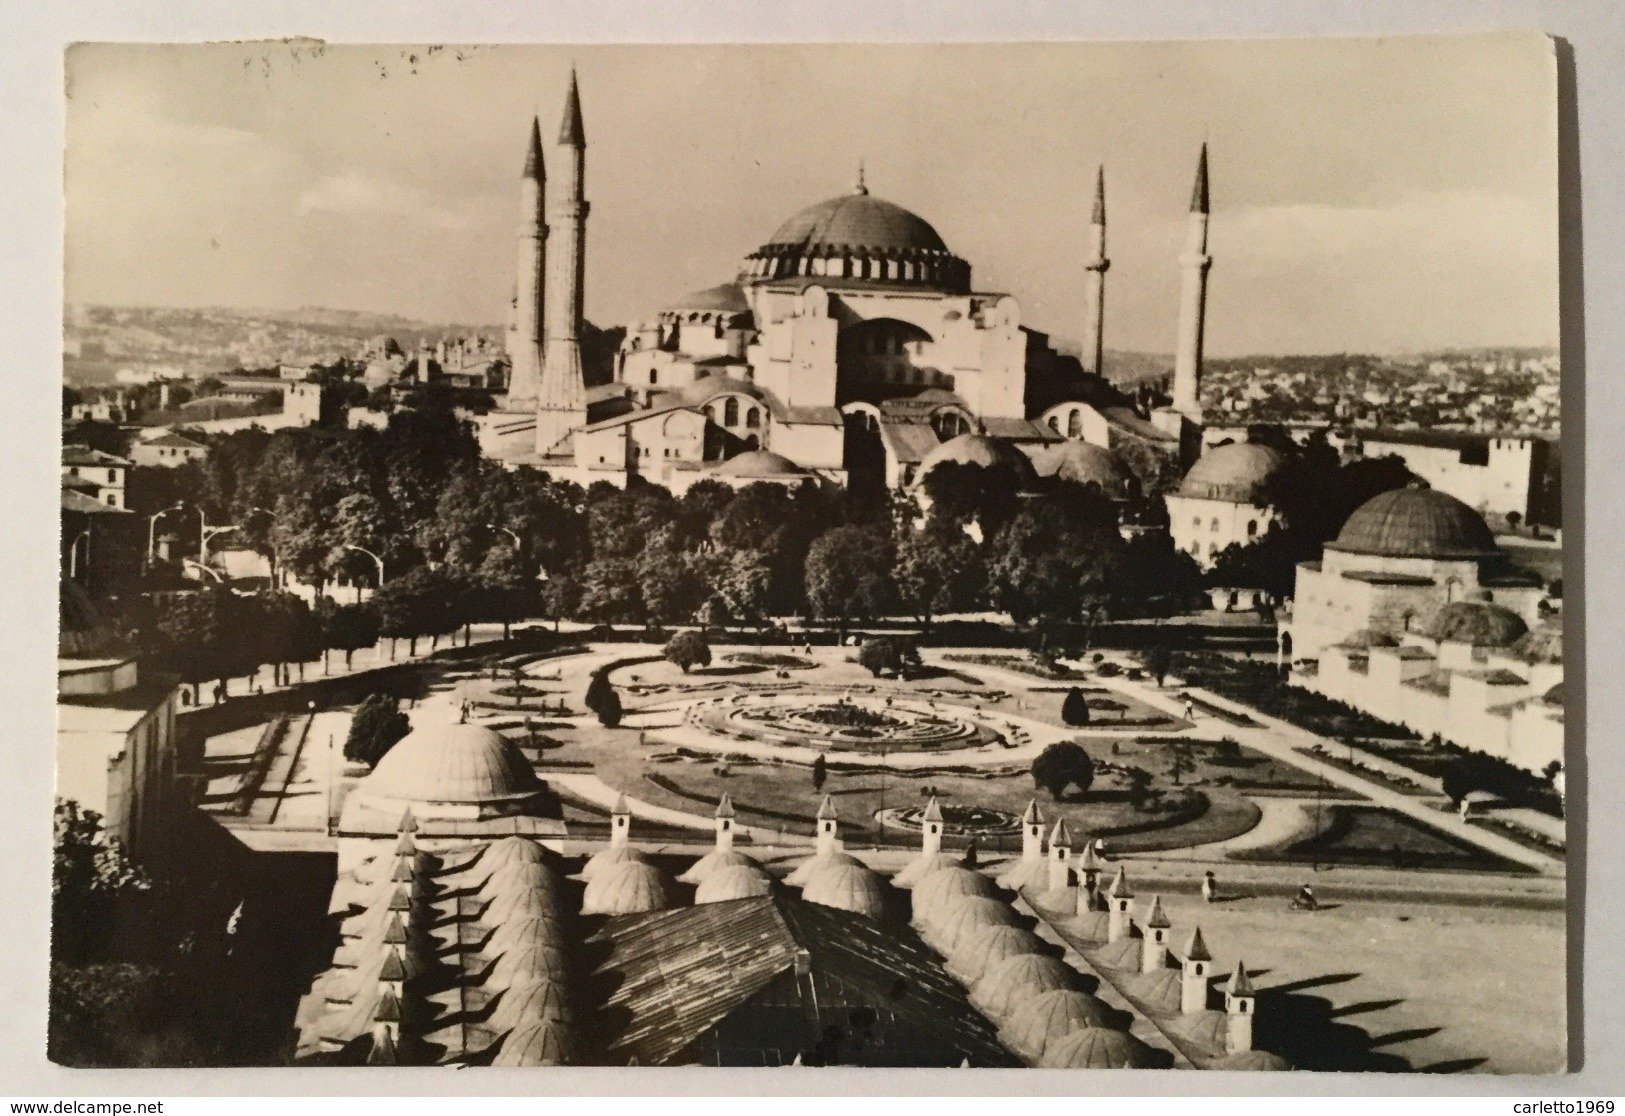 ISTANBUL - THE SAINT SOPHIE MOSQUE VIAGGIATA FG - Turchia